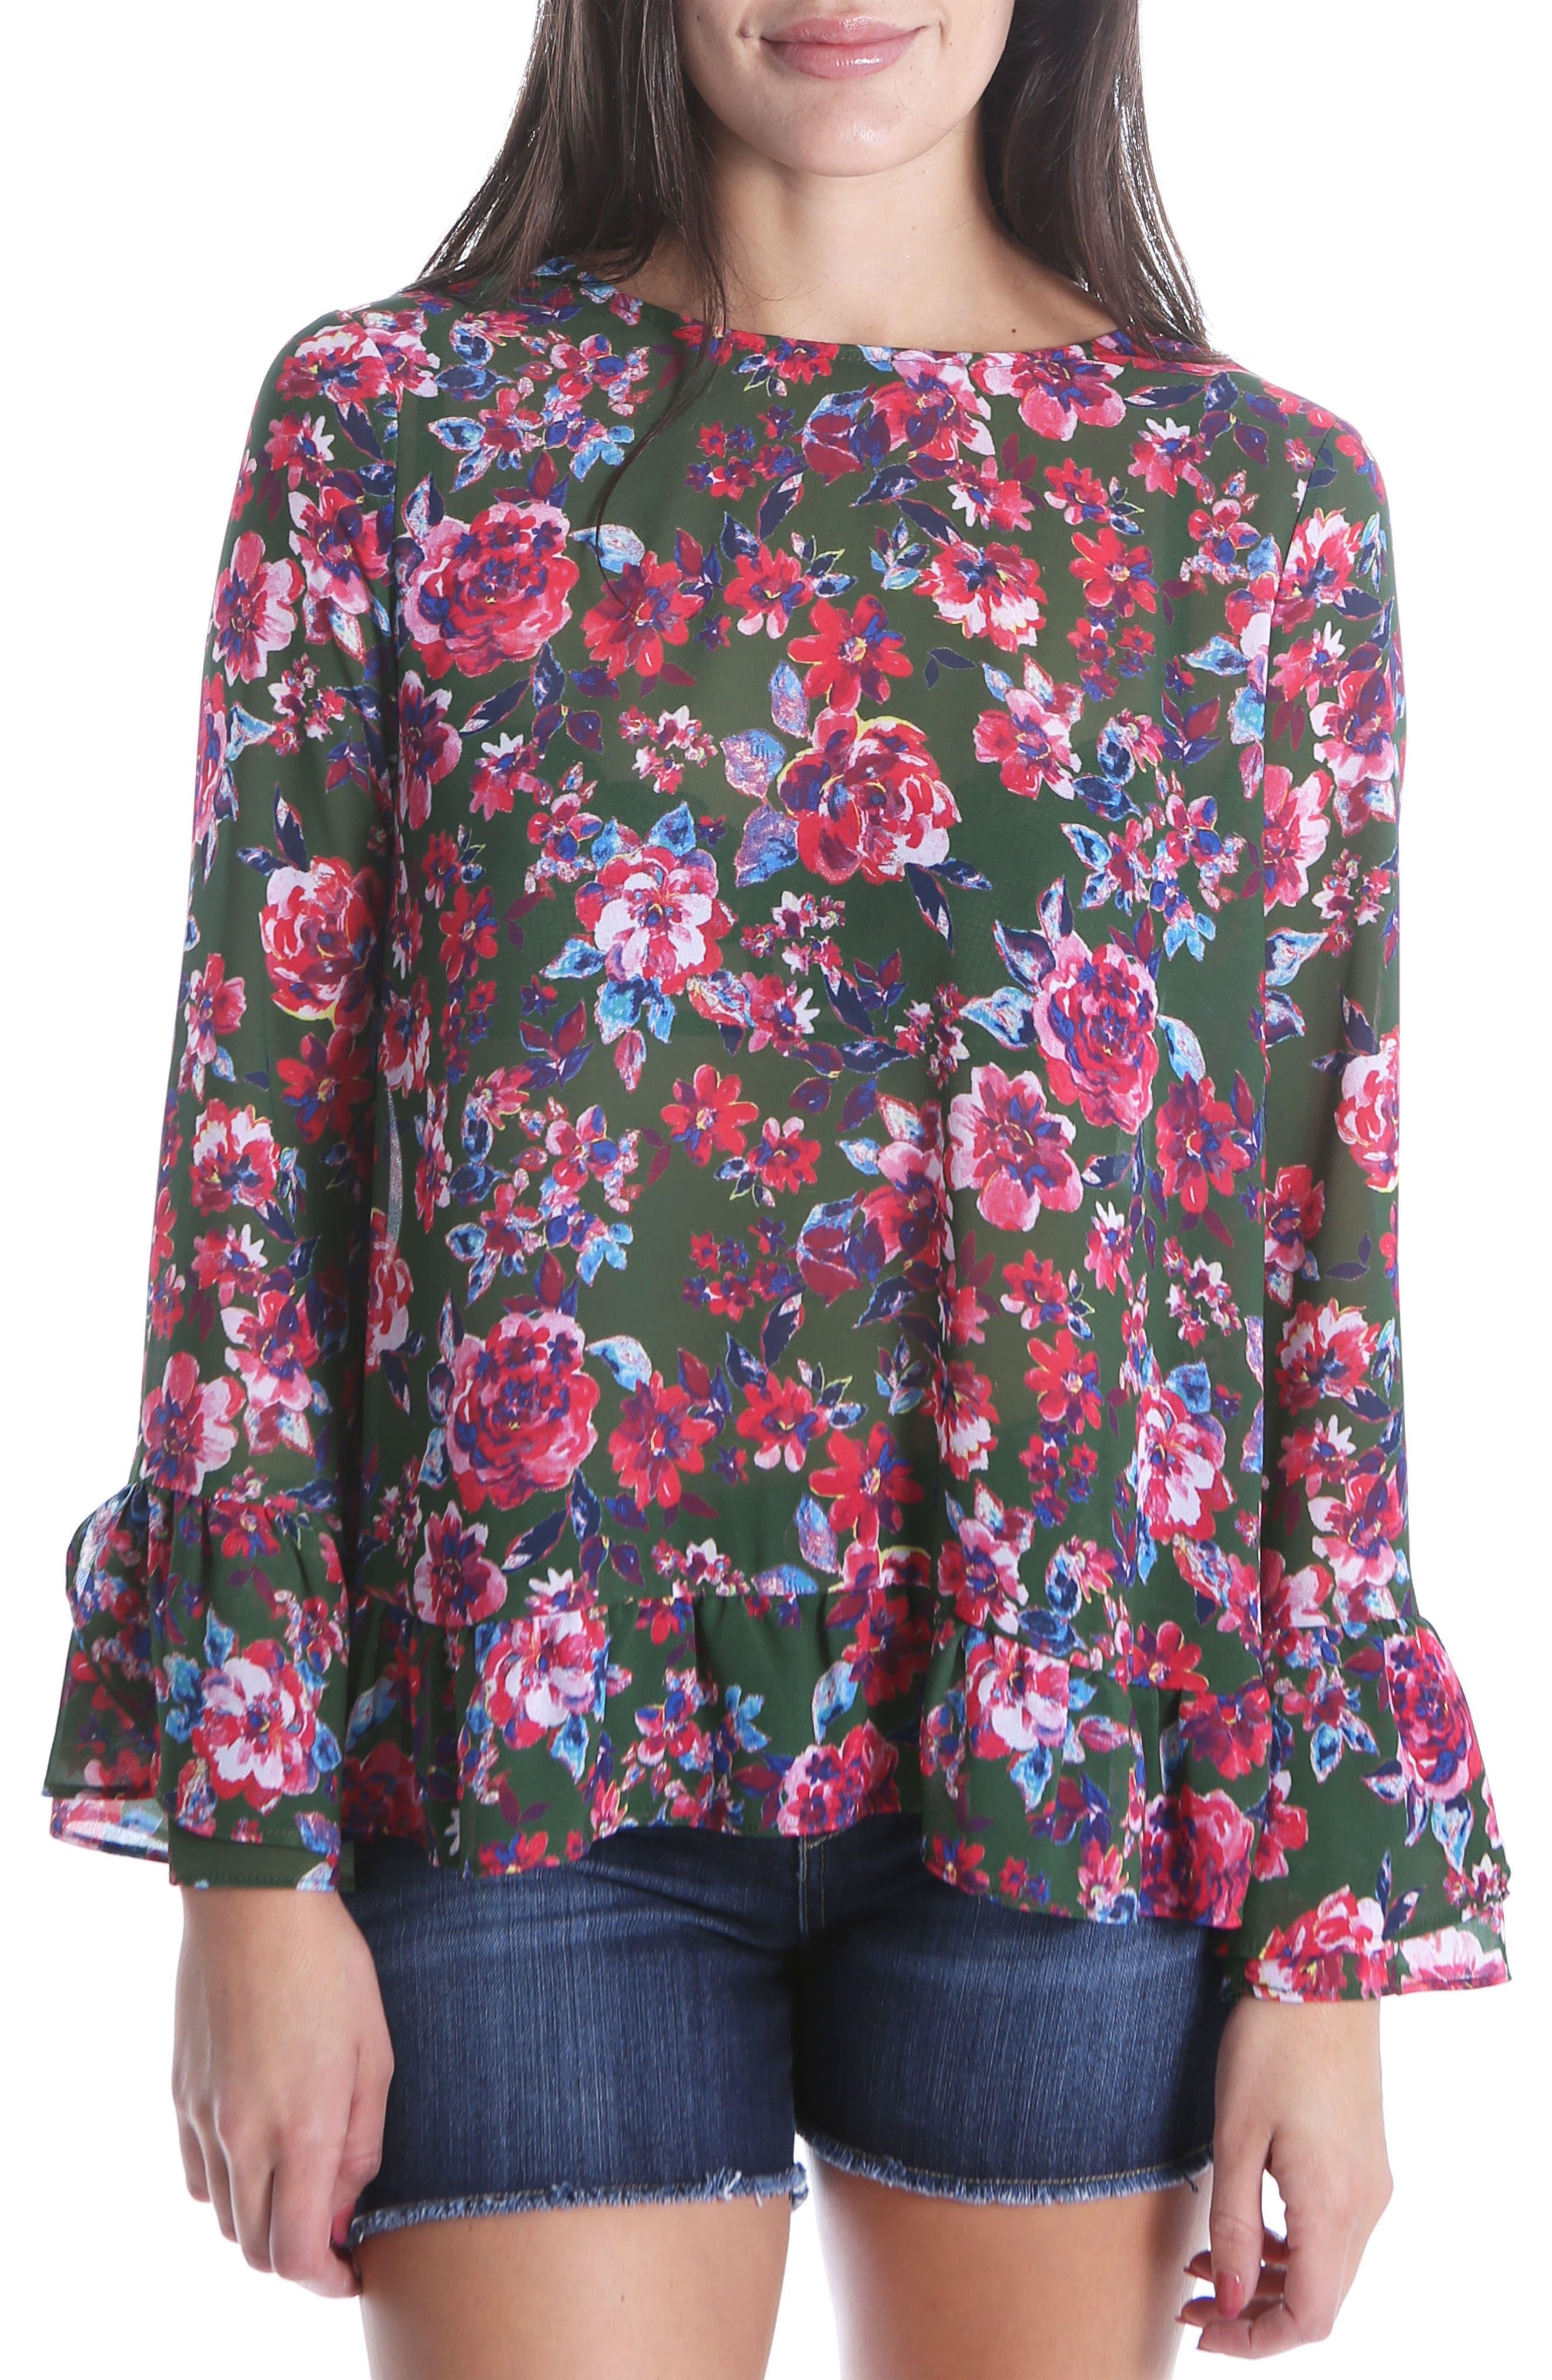 Trixy Ruffle Sleeve Floral Top,                             Main thumbnail 1, color,                             Pine